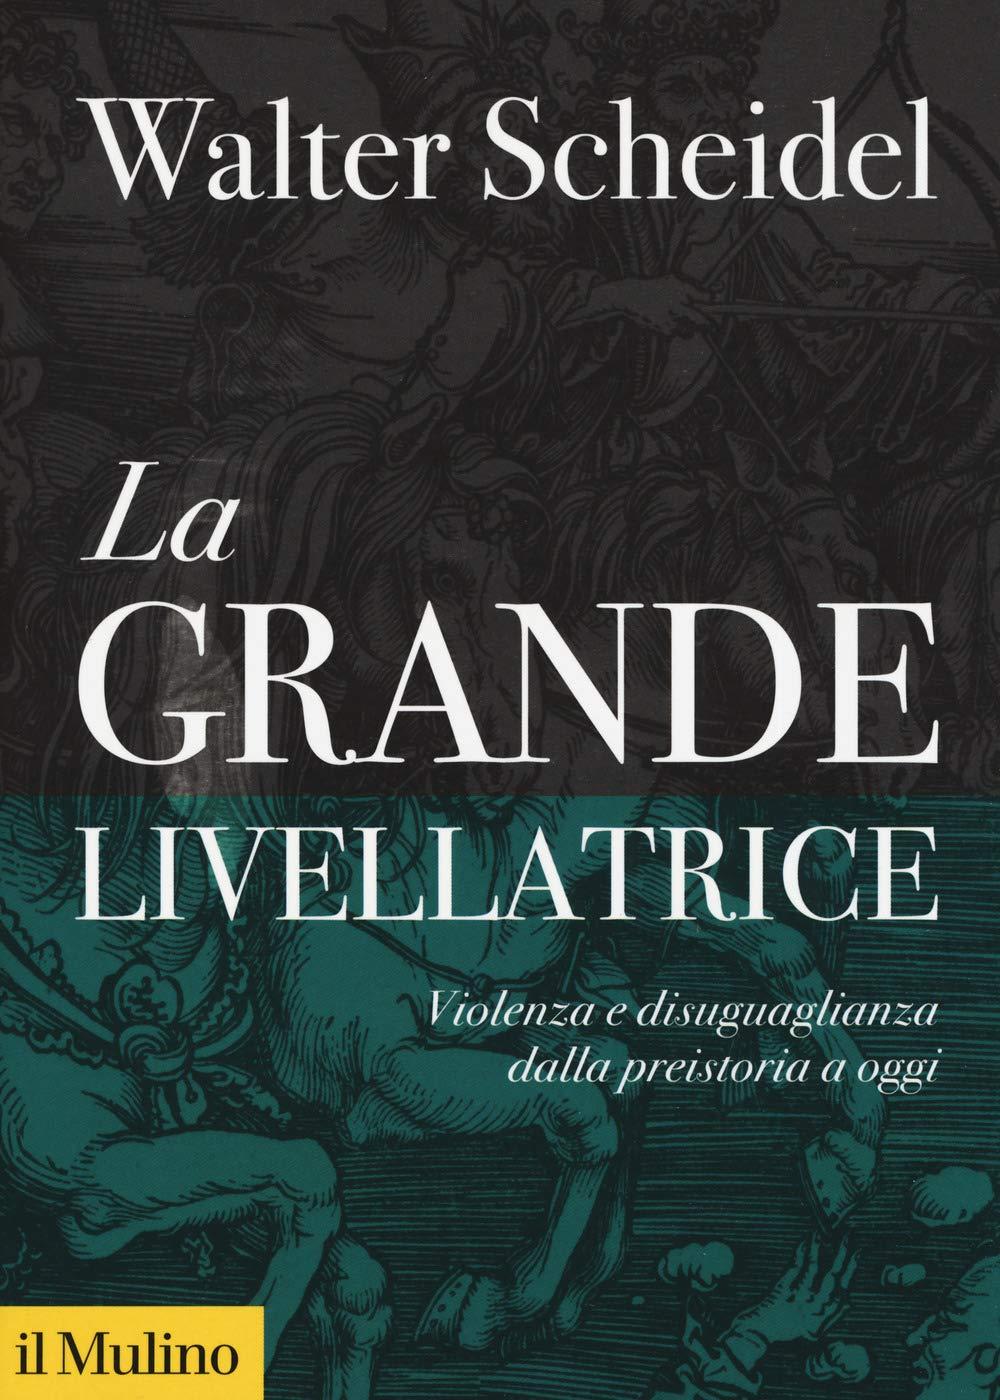 livellatrice